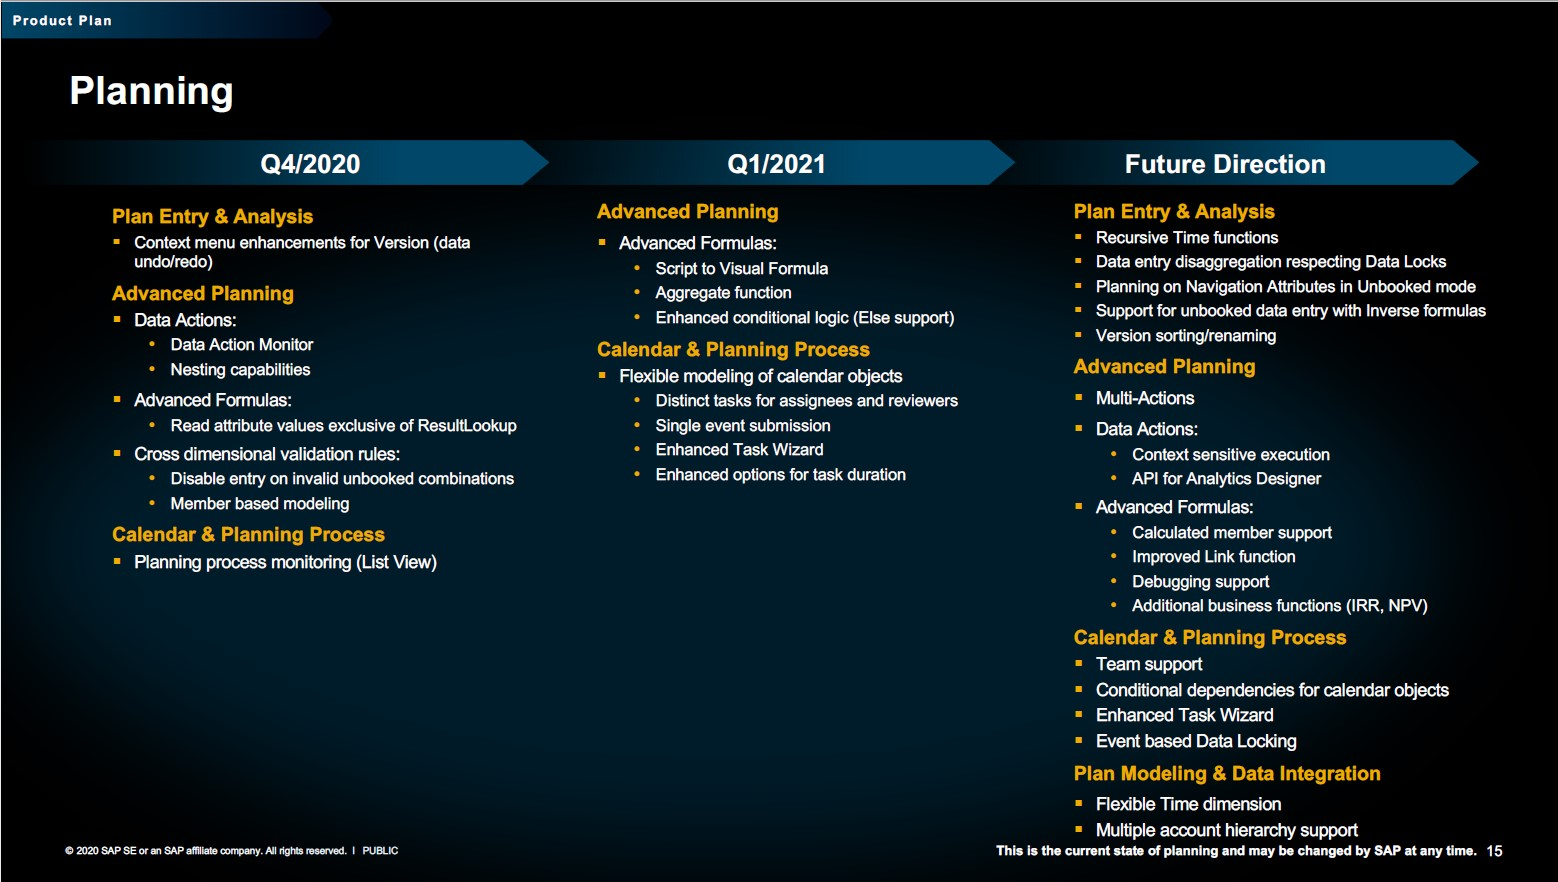 SAC Planning Roadmap